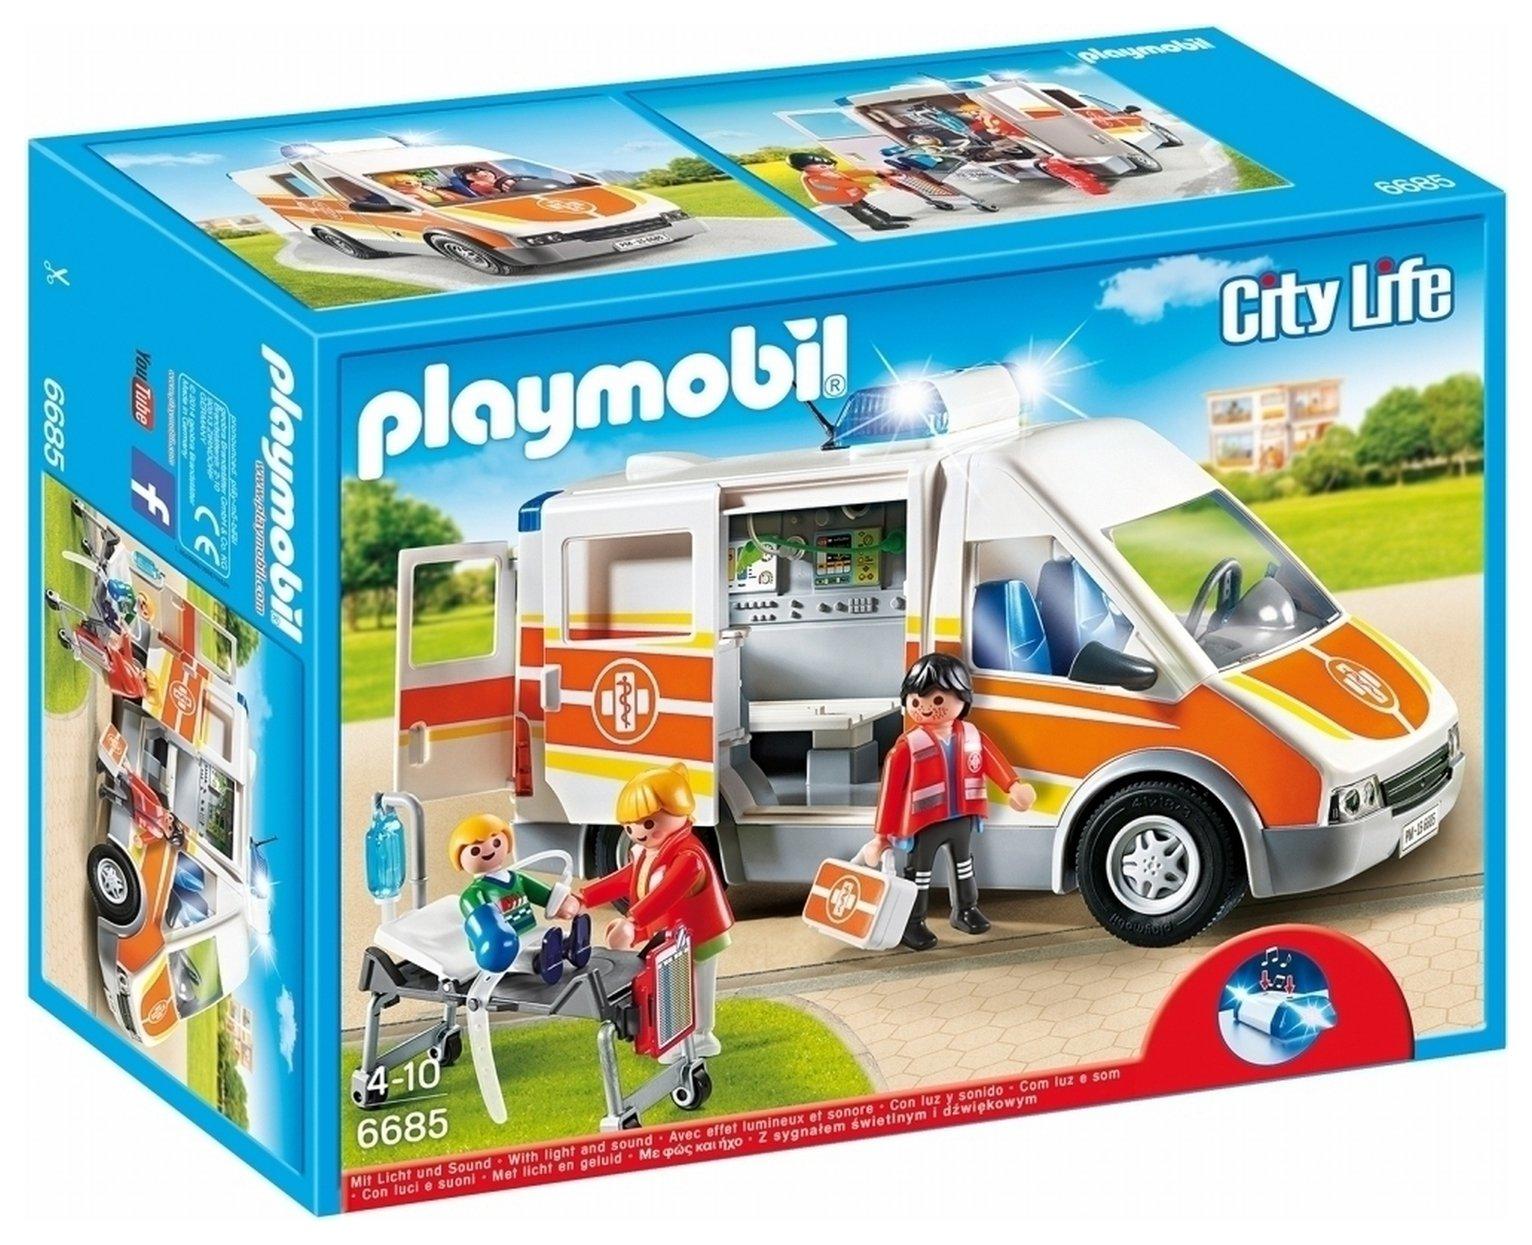 Playmobil 6685 City Life Ambulance With Lights & Sounds.